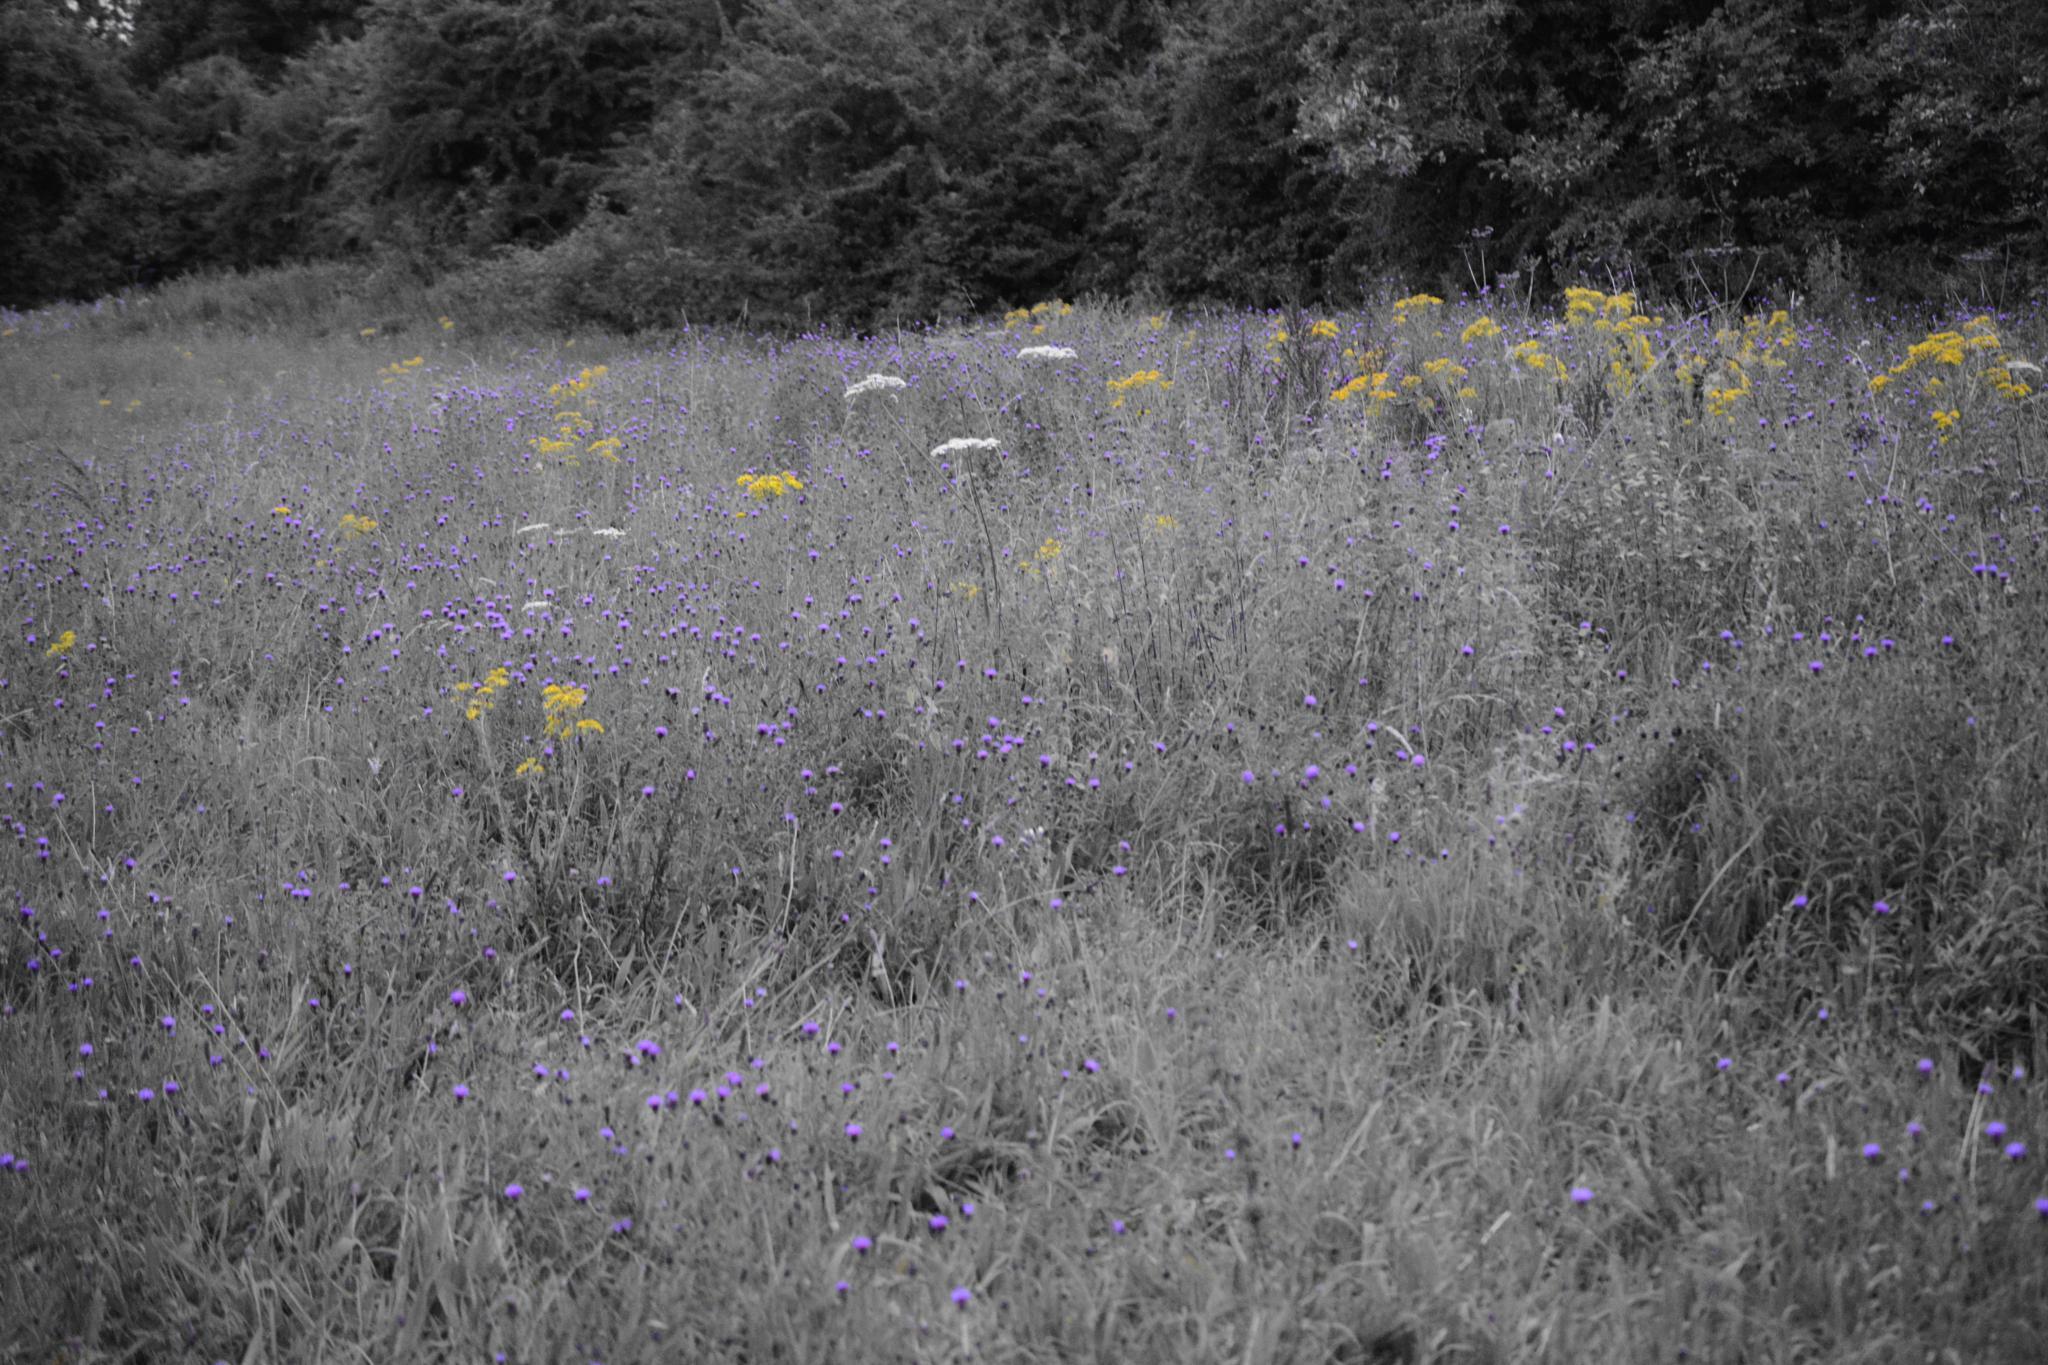 Sea of Yellow & Purple by adam.west.79677